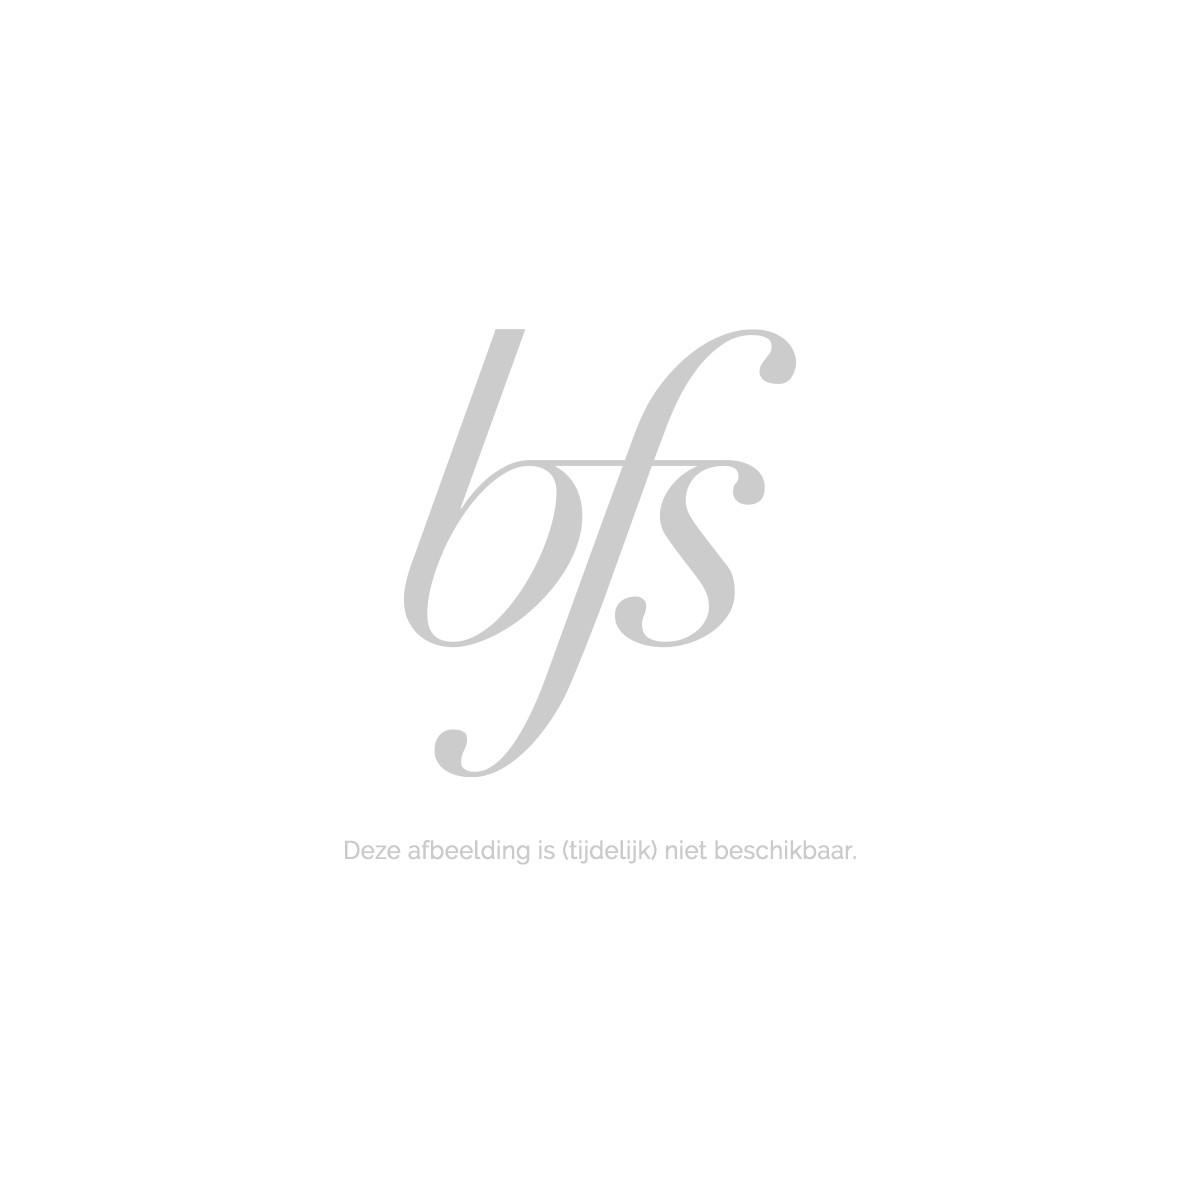 Dr. Tadlea Cosmetica Biobalance Face Wash 200 Ml